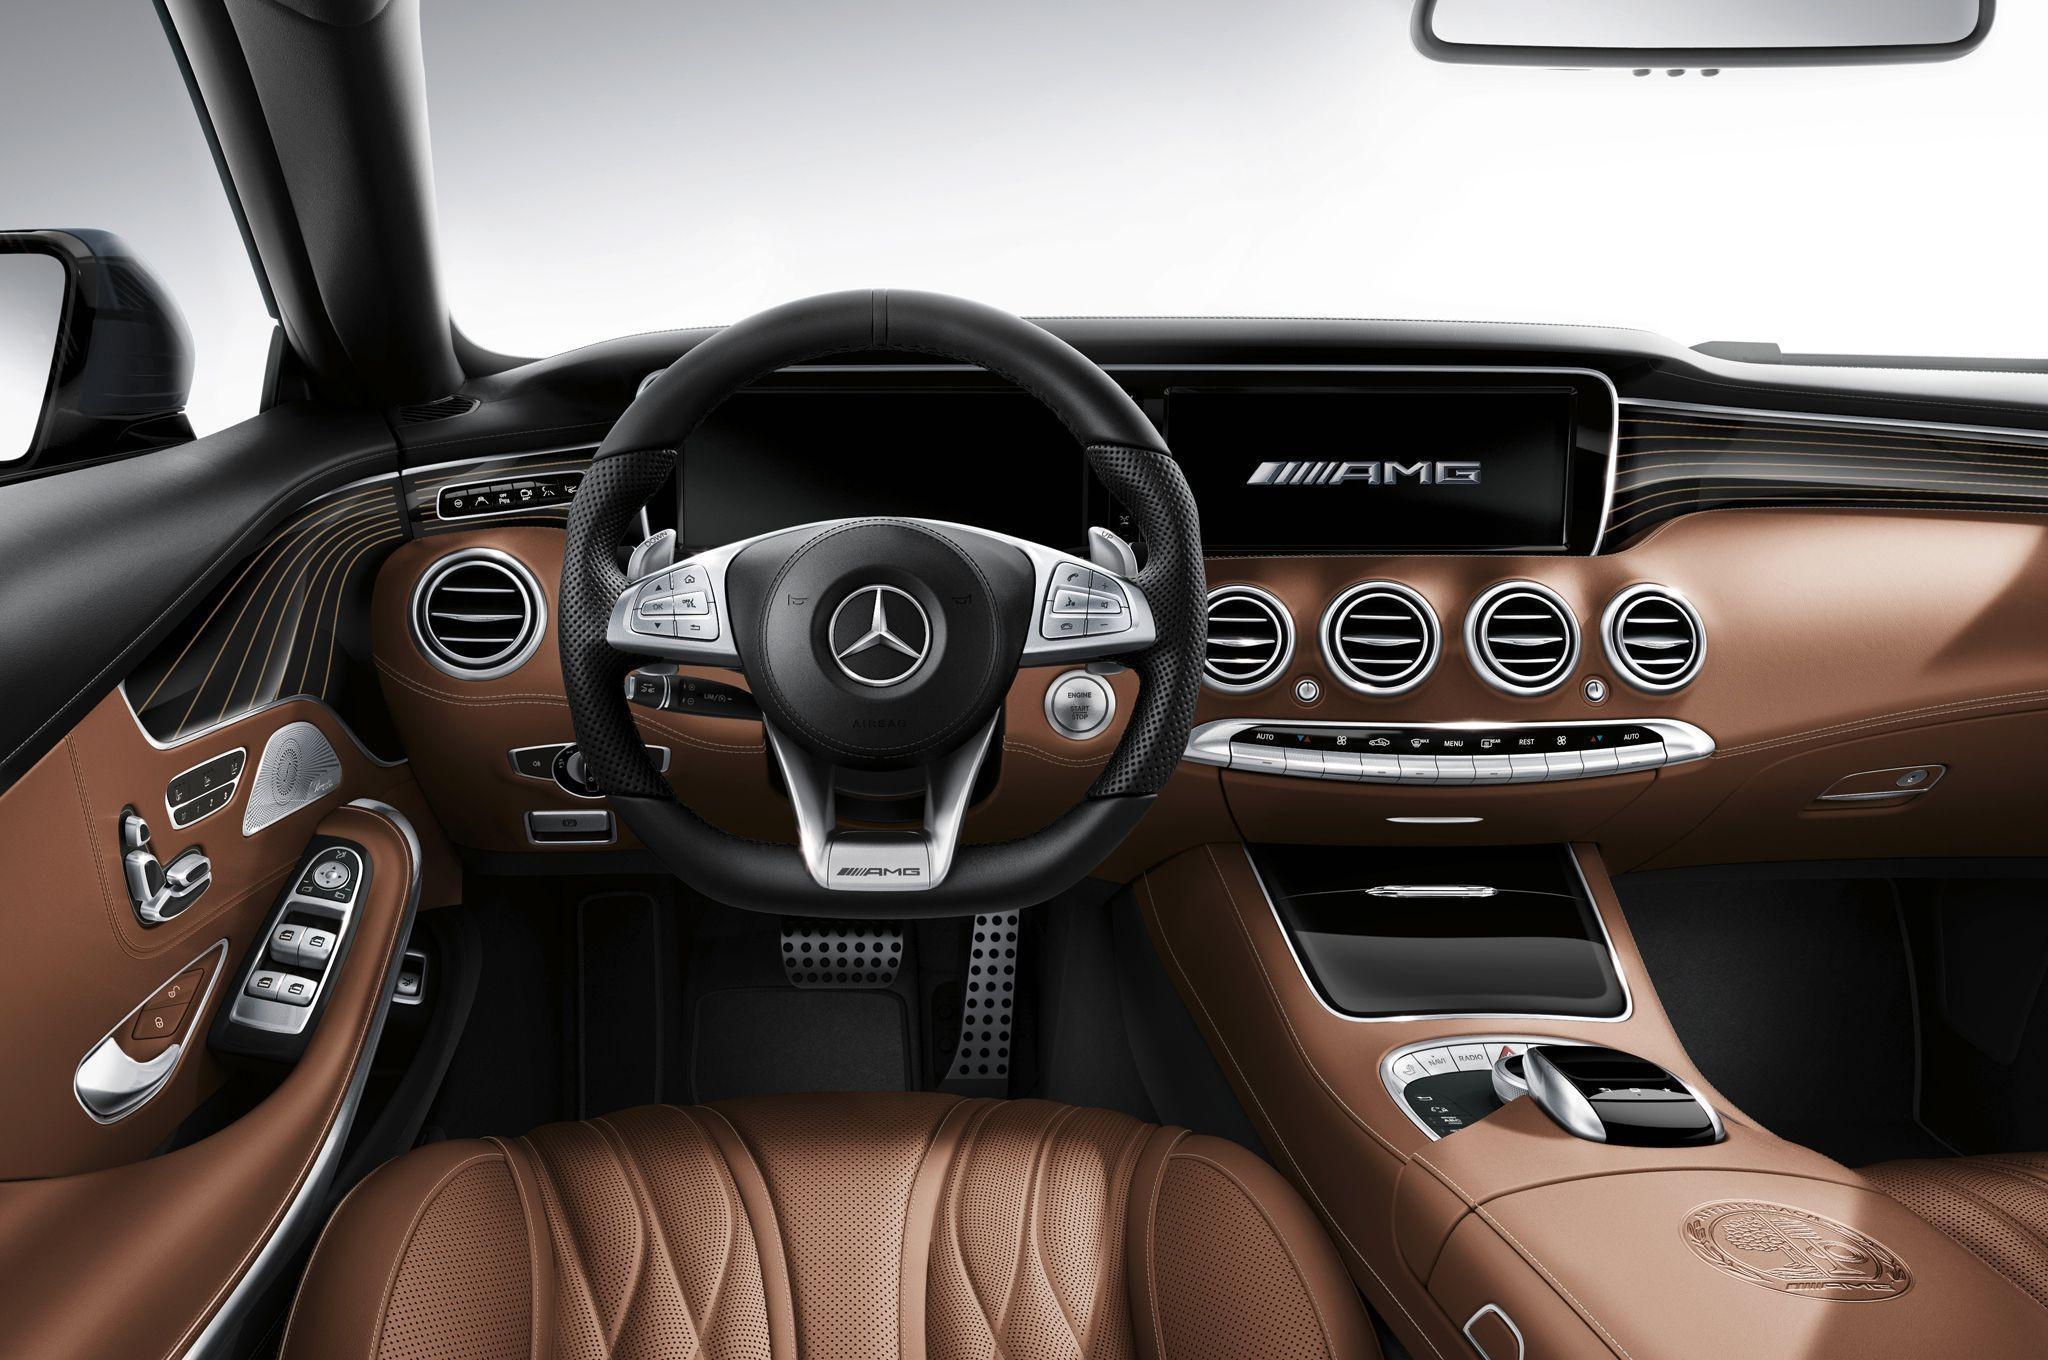 Mercedes Benz S65 AMG 2